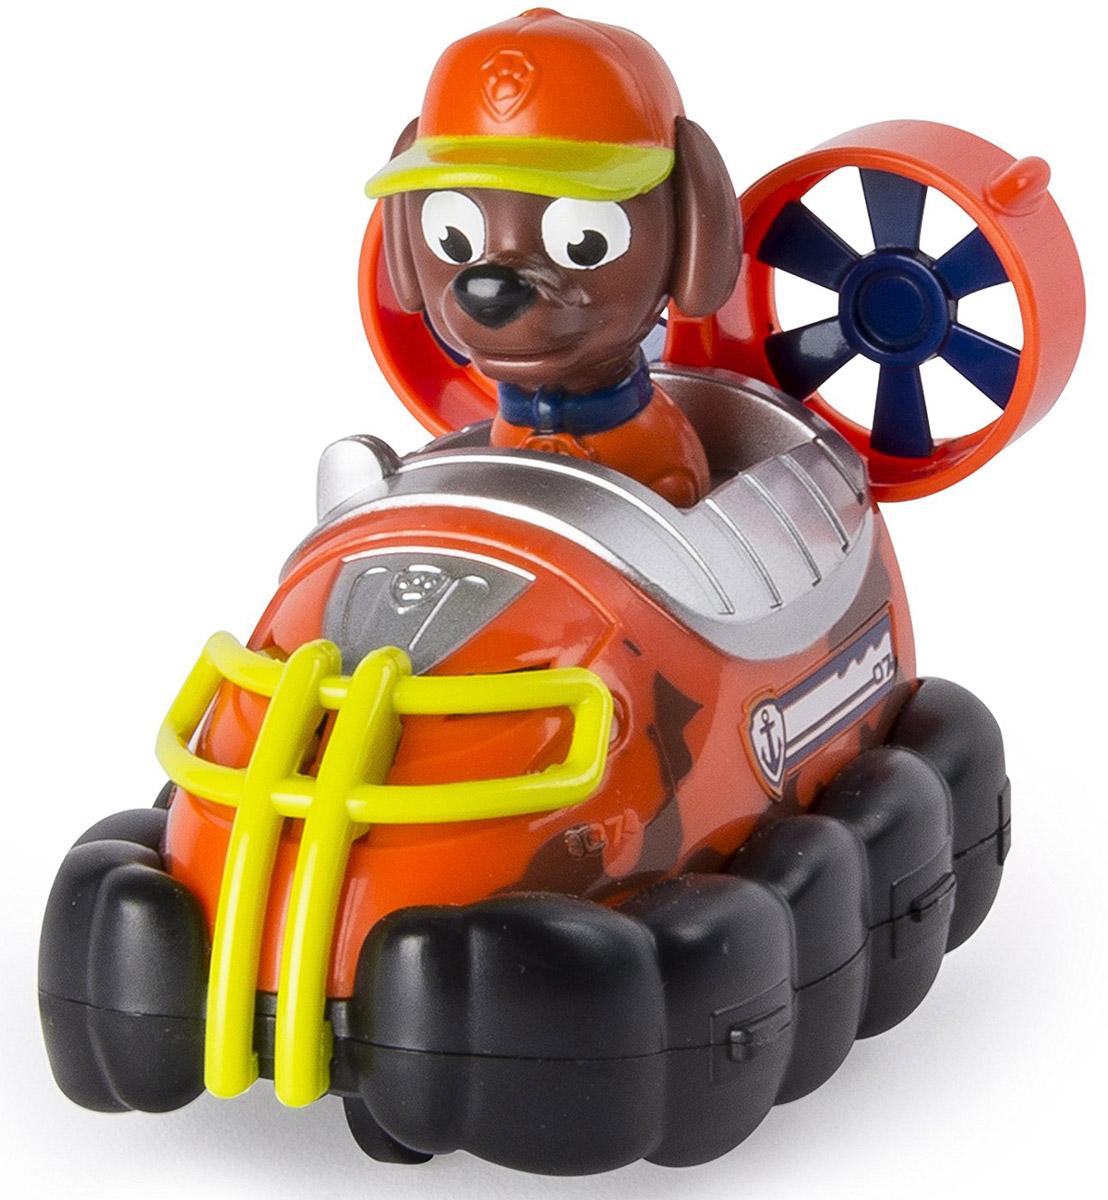 Paw Patrol Машинка спасателя Zuma игрушка paw patrol маленькая машинка спасателя